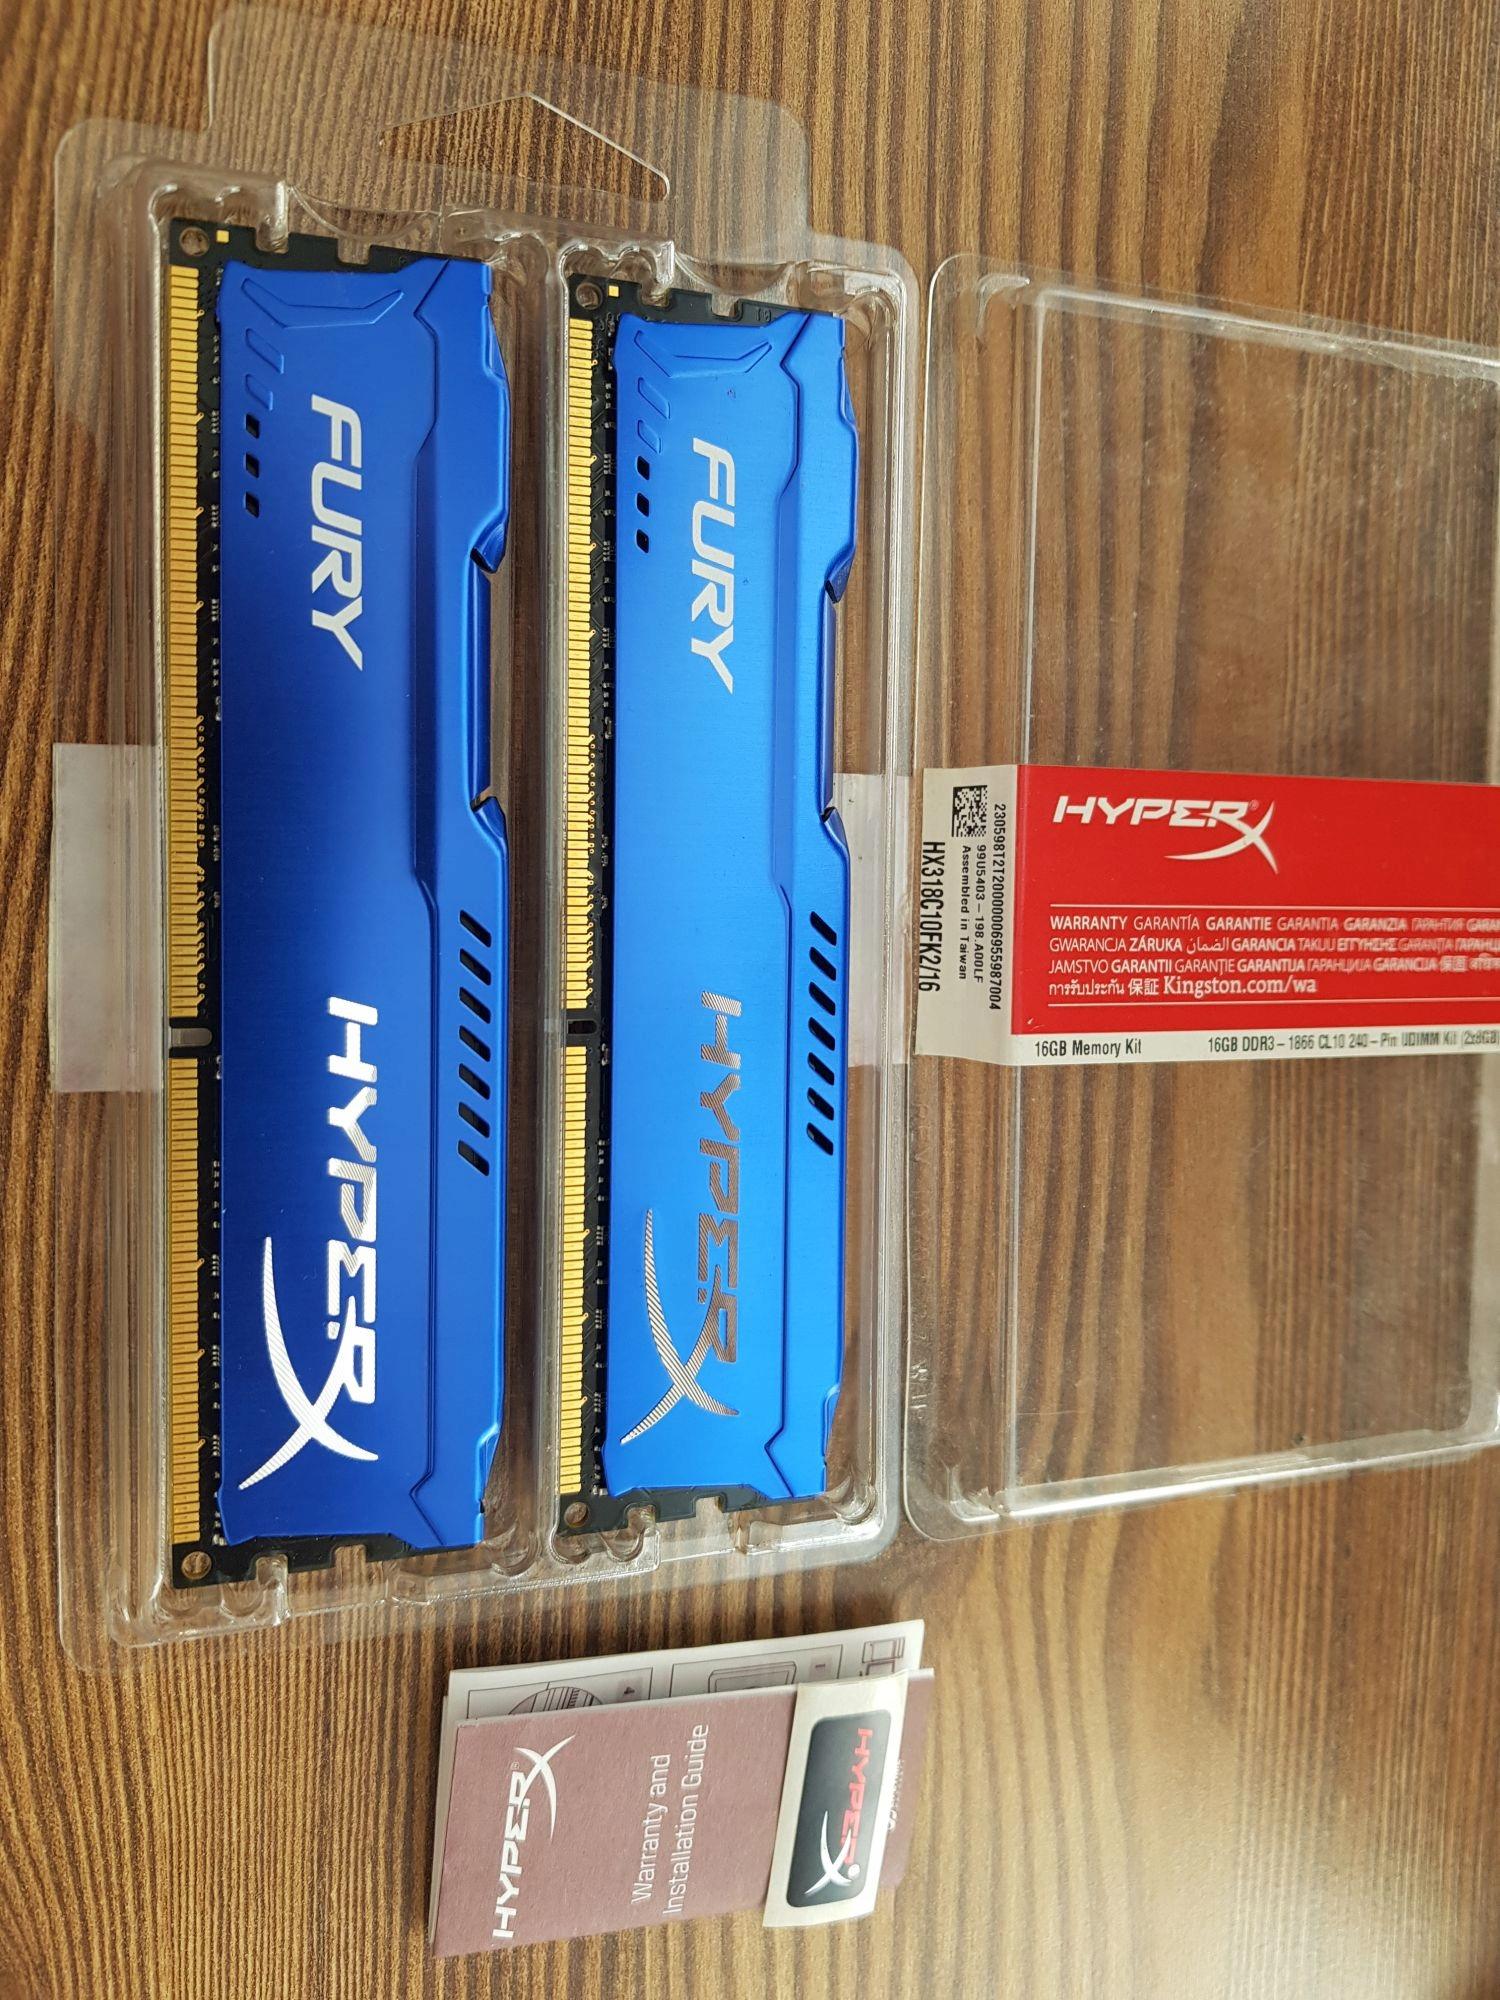 16GB KINGSTON HYPERX FURY 2x8 GB DDR3 1866 MHz L10